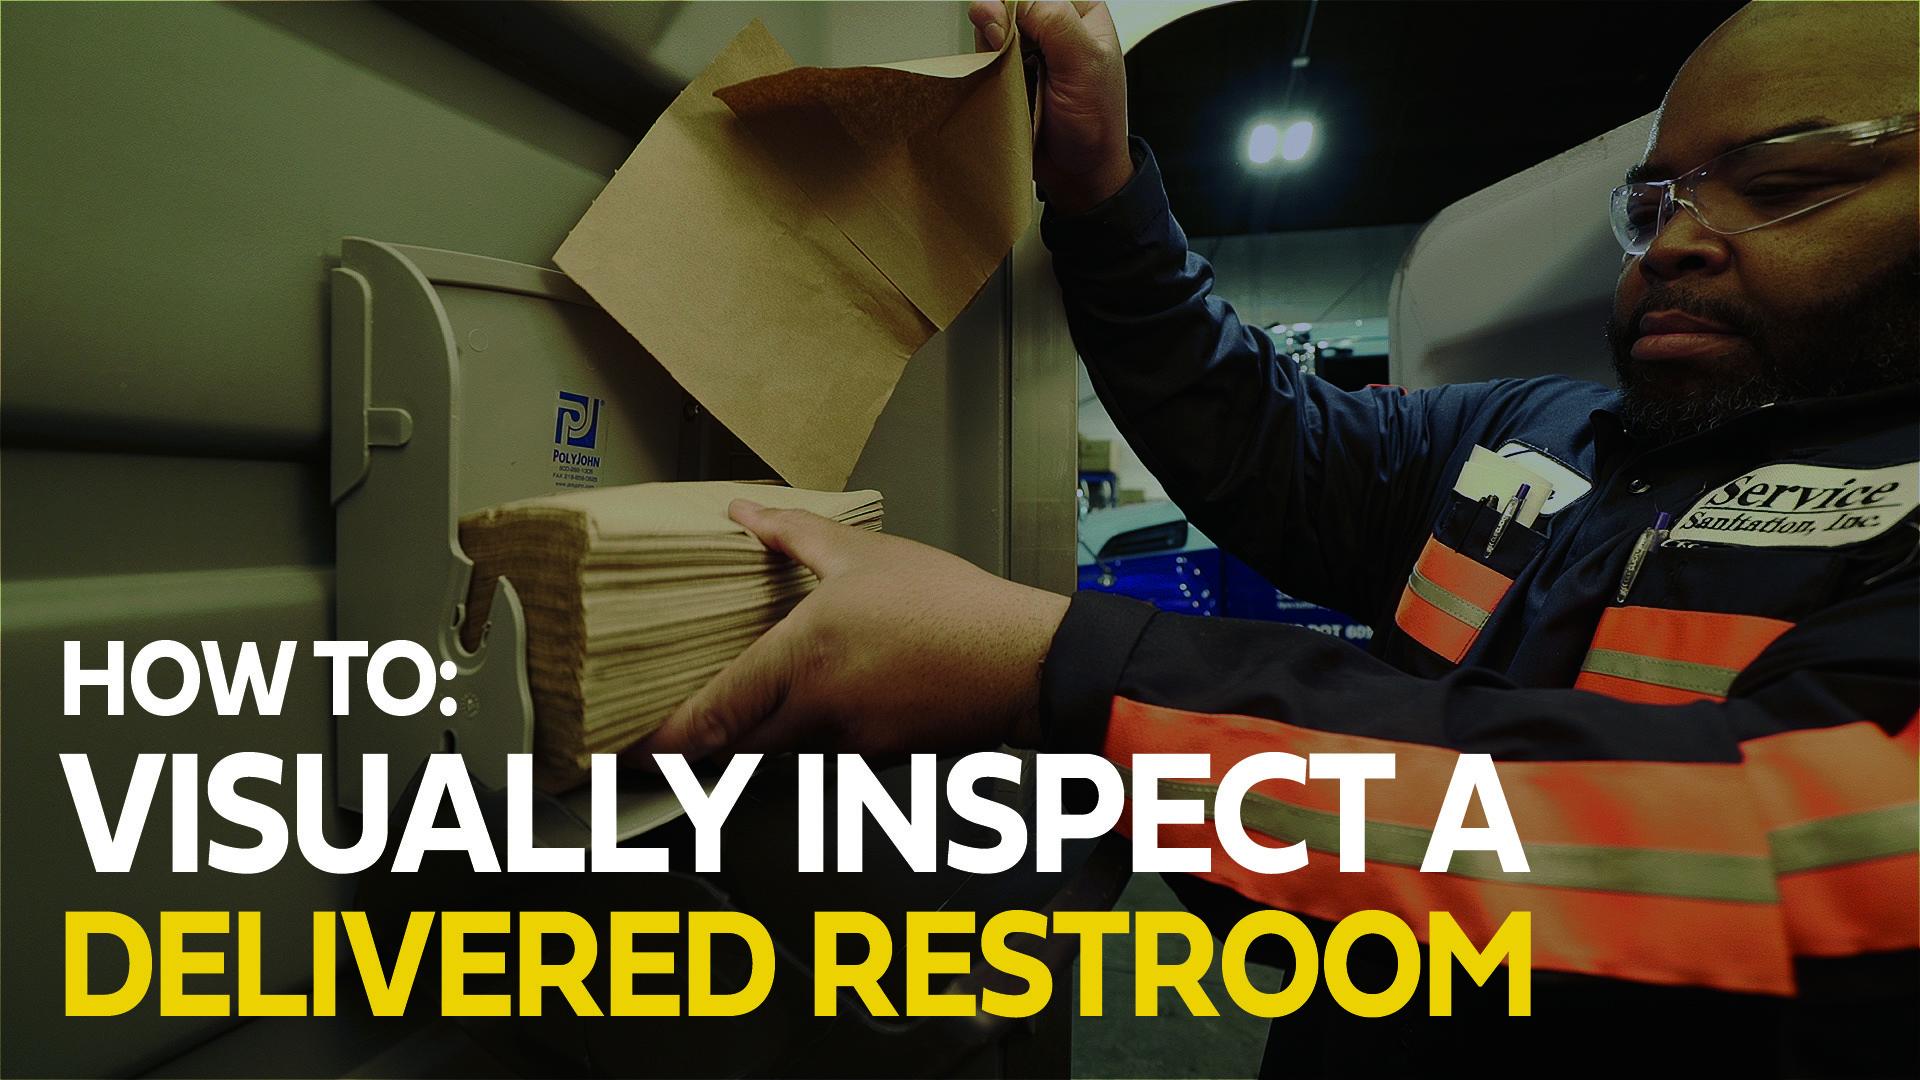 4. Inspecting delivered unit